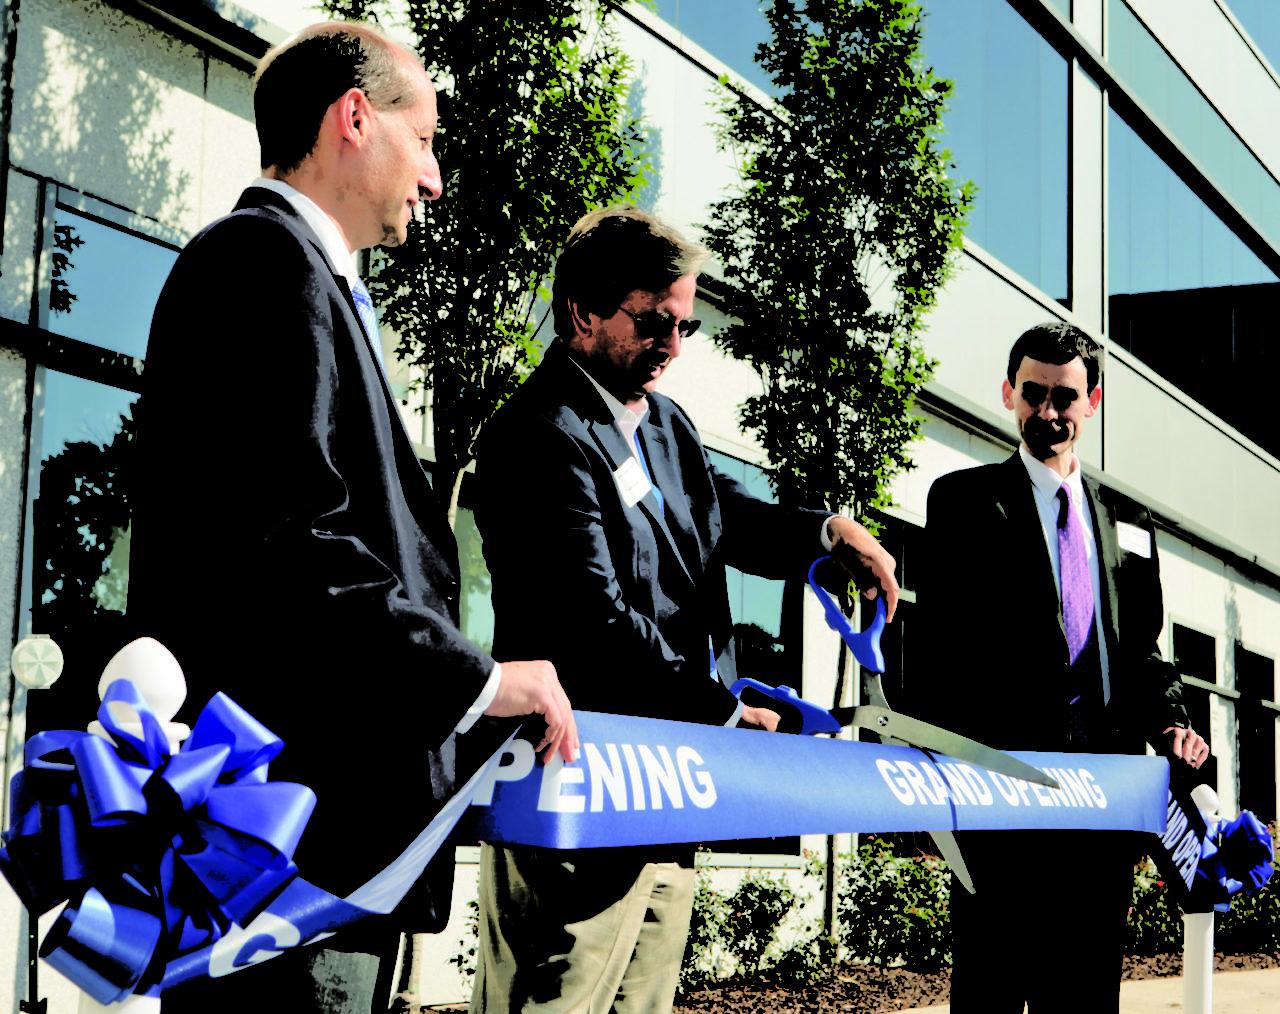 UTC Aerospace executives inaugurate the new facility with a ribbon-cutting ceremony